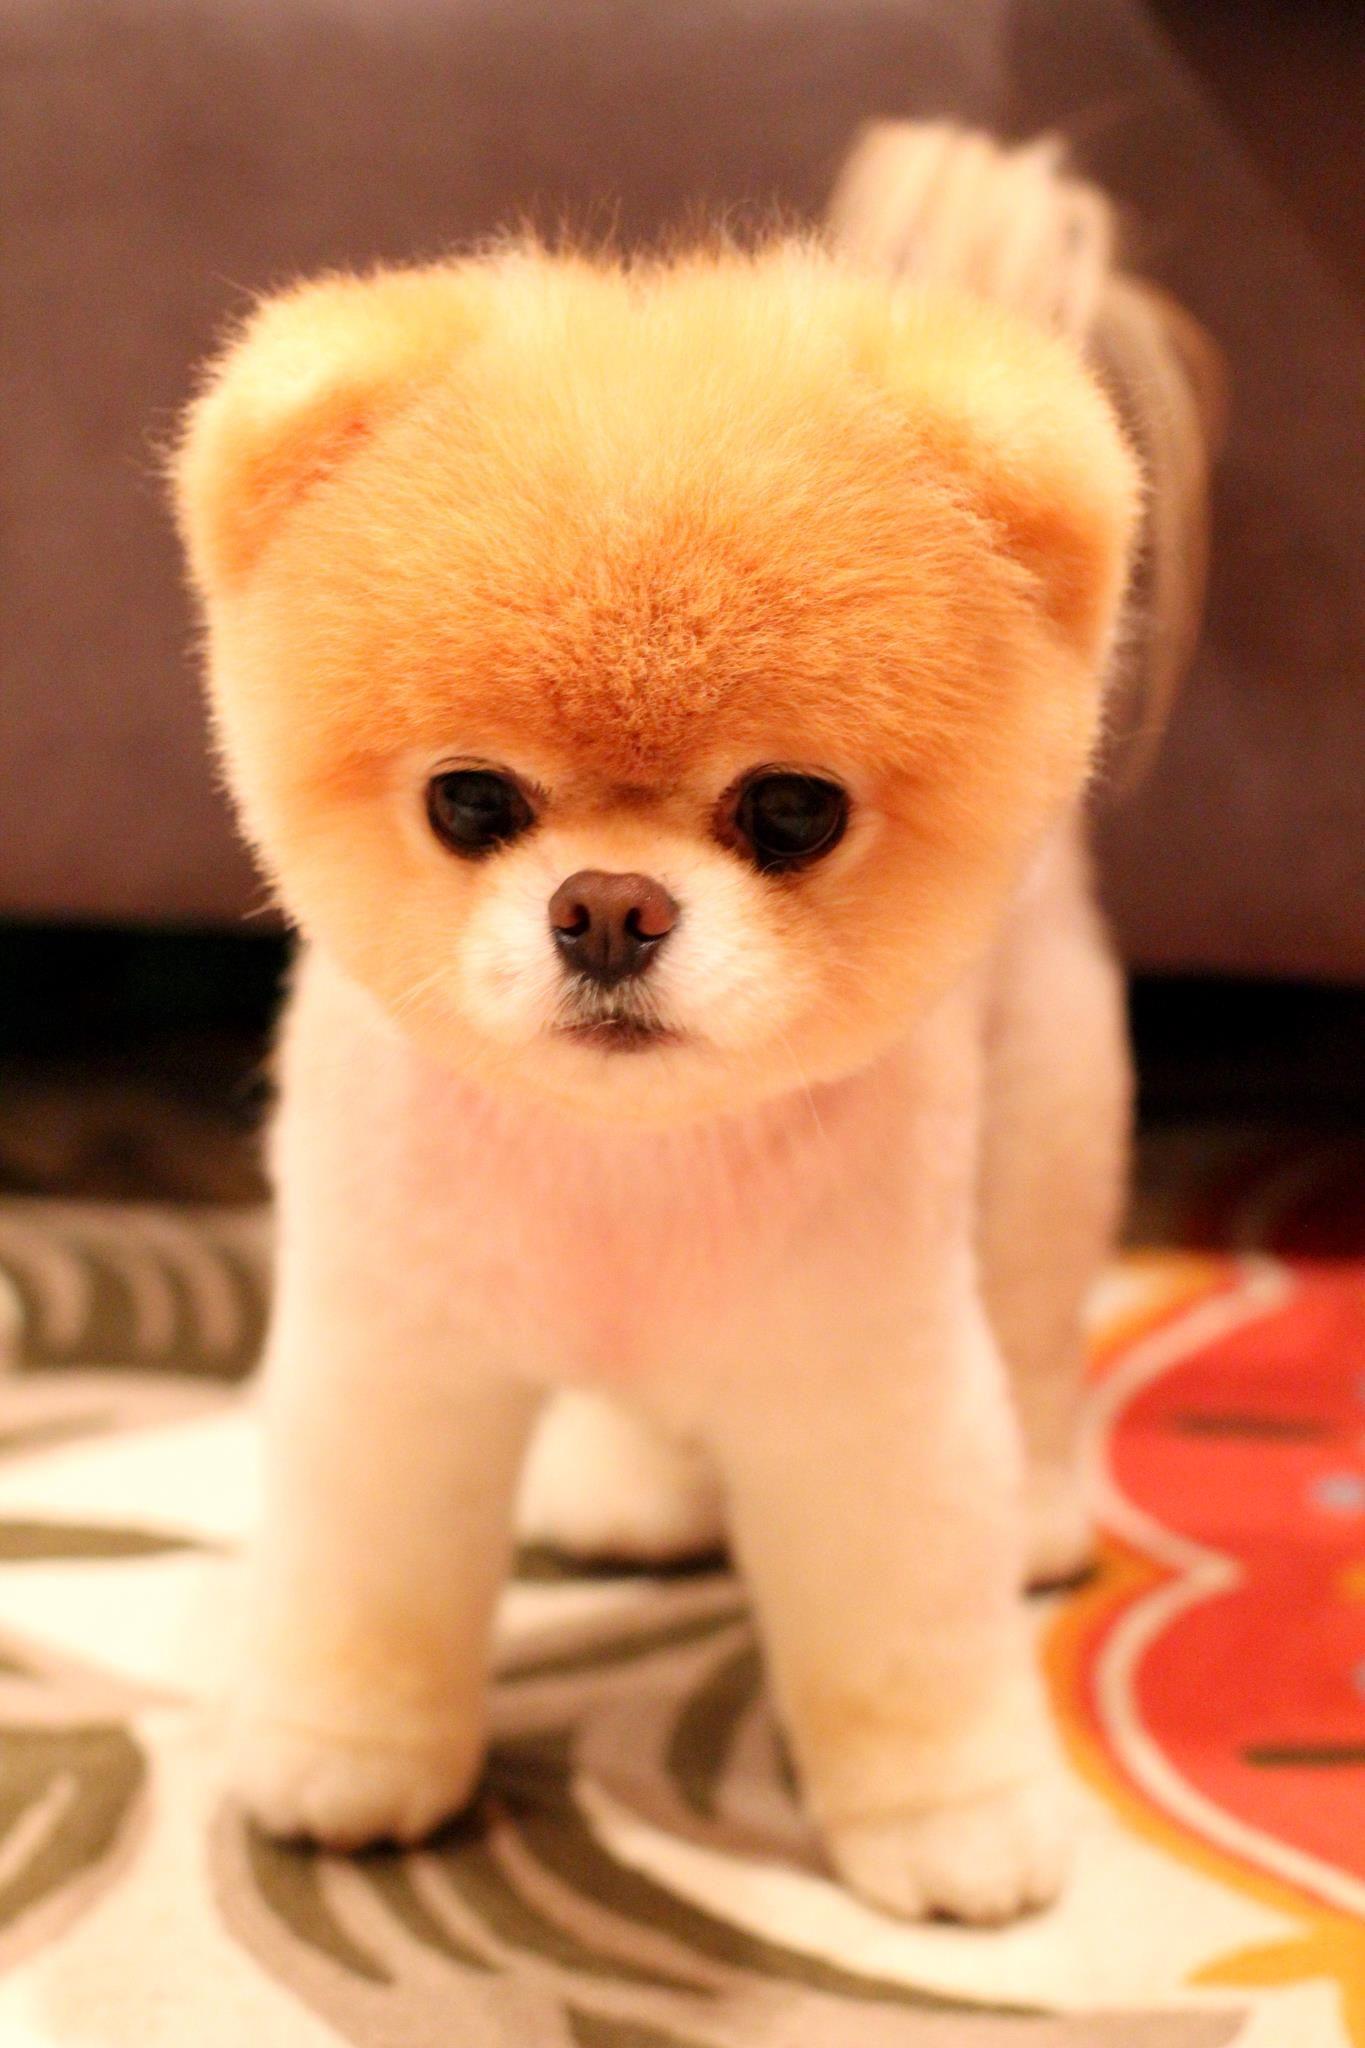 Wonderful Mixed Chubby Adorable Dog - a3e57e69d54022fc71ecf6de2d476282  Image_557471  .jpg